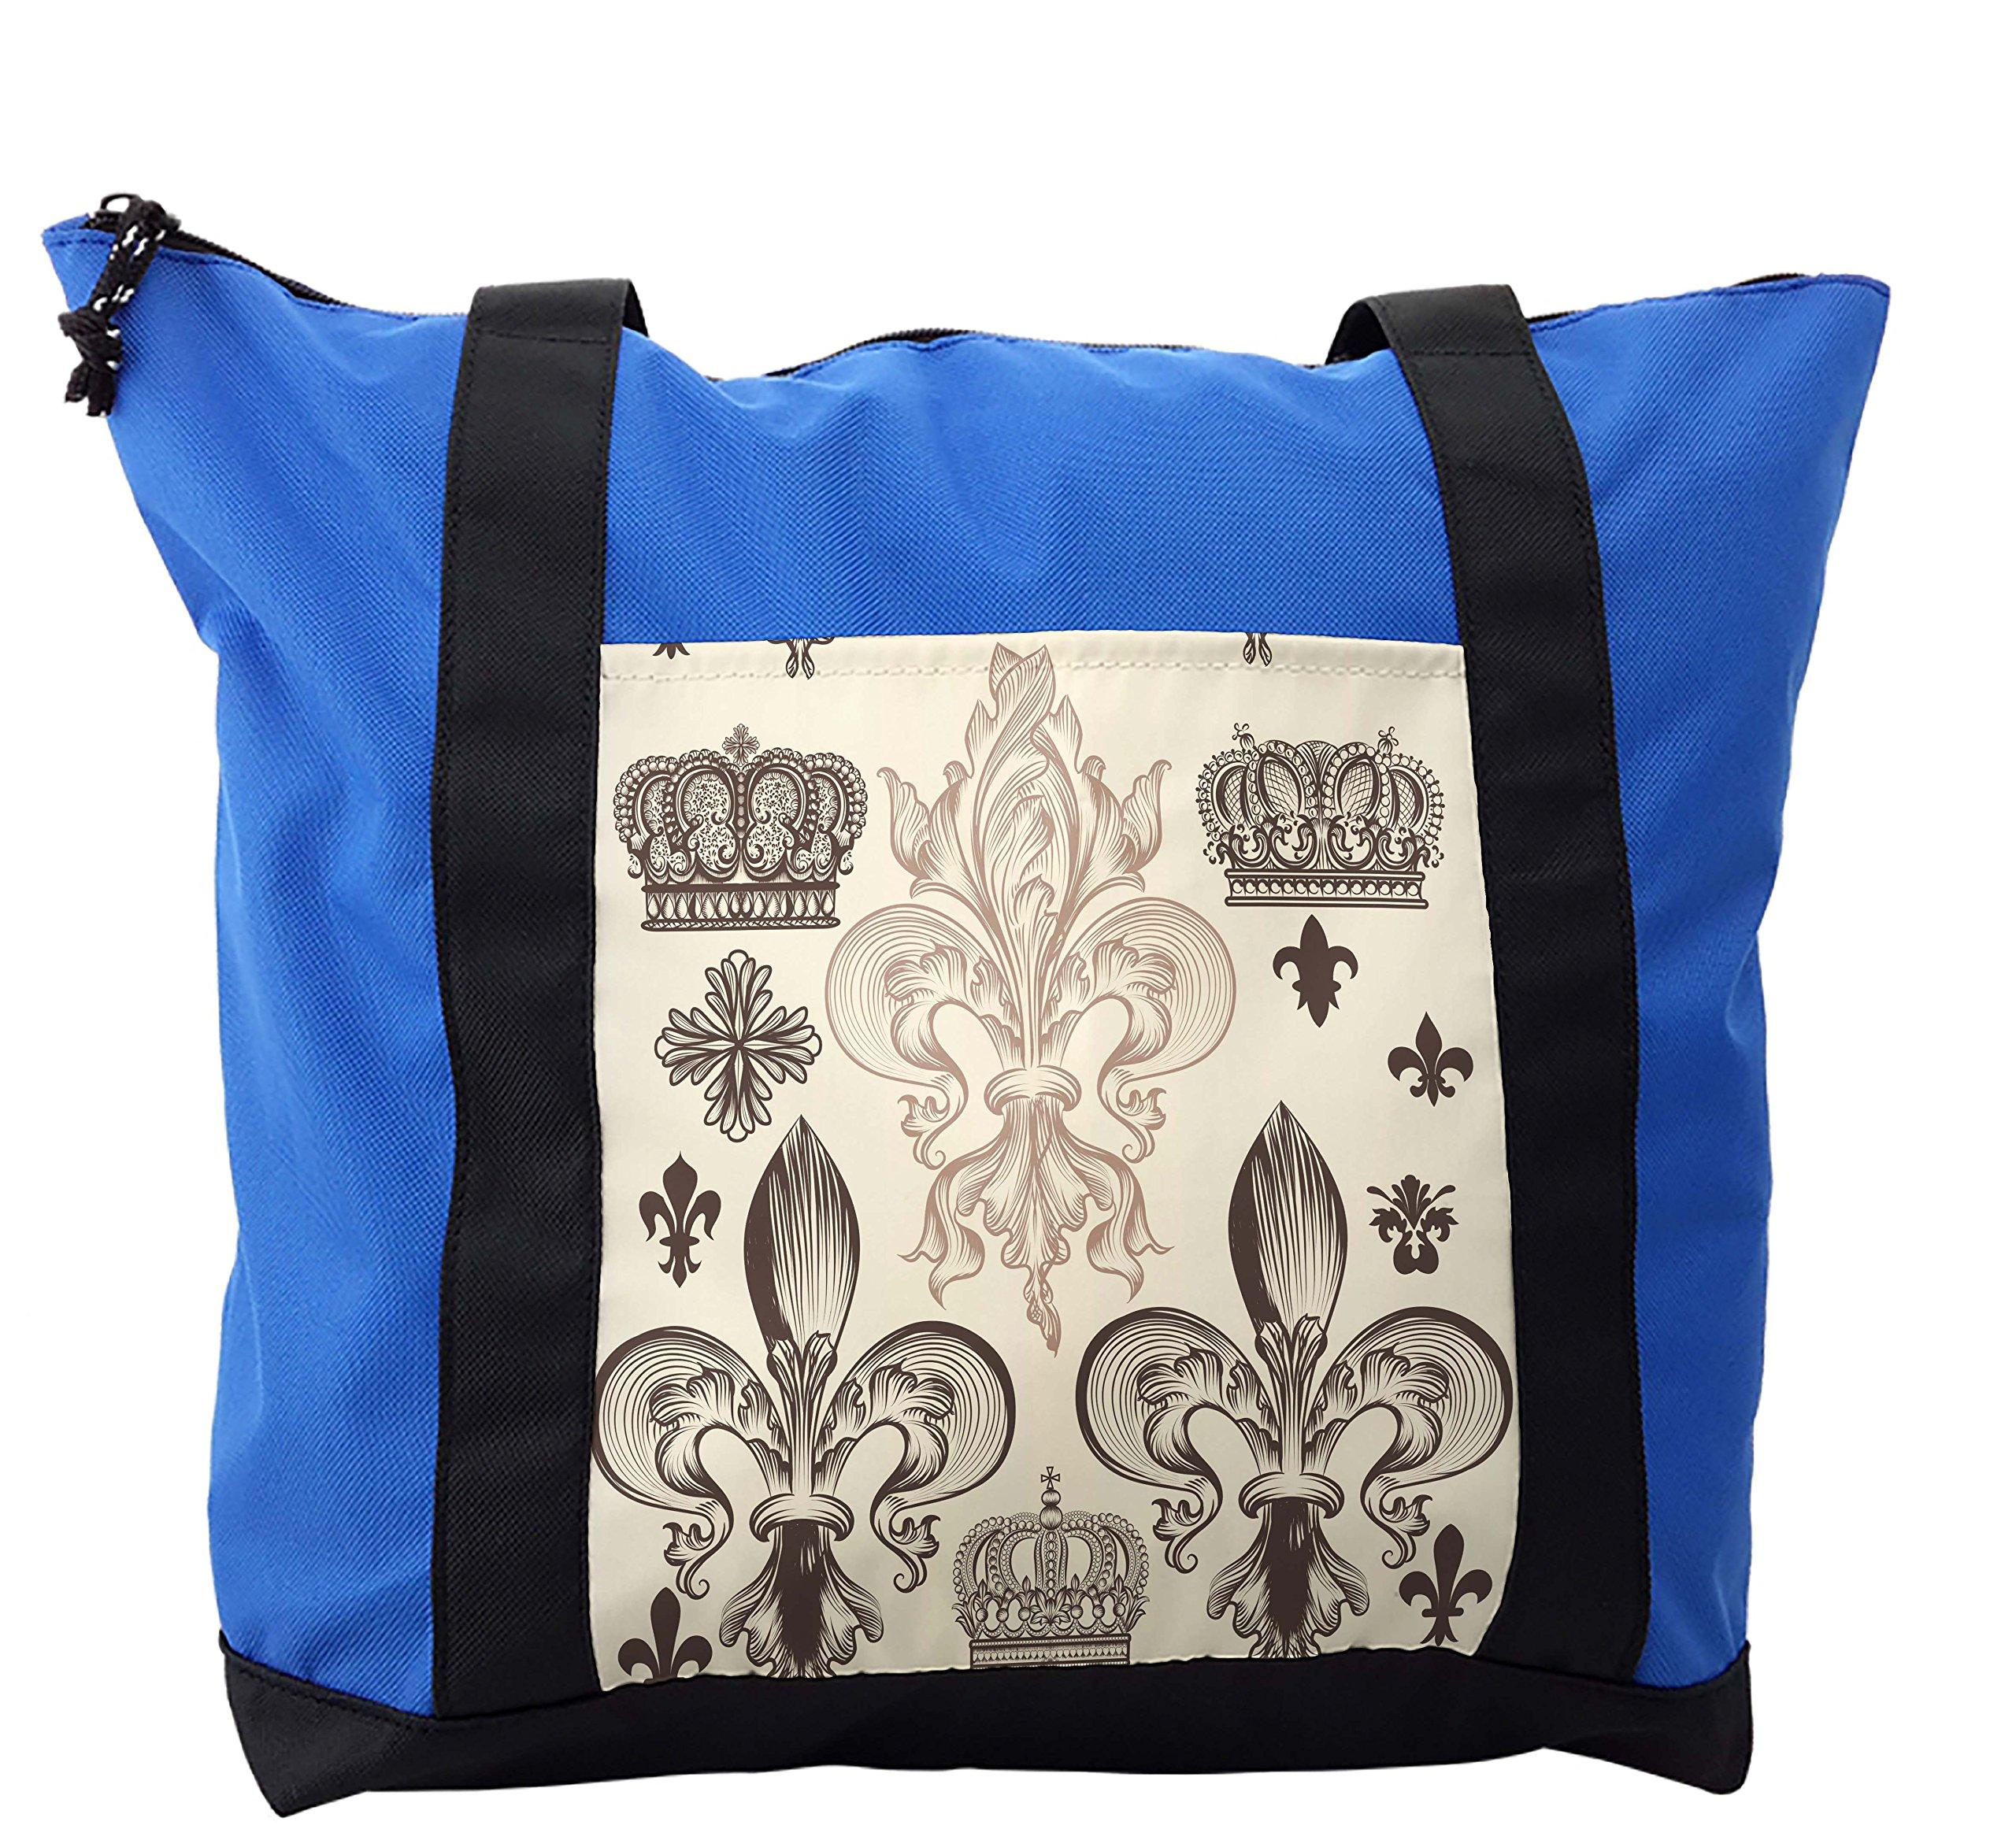 Lunarable Fleur De Lis Shoulder Bag, Heraldic Coat of Arms, Durable with Zipper